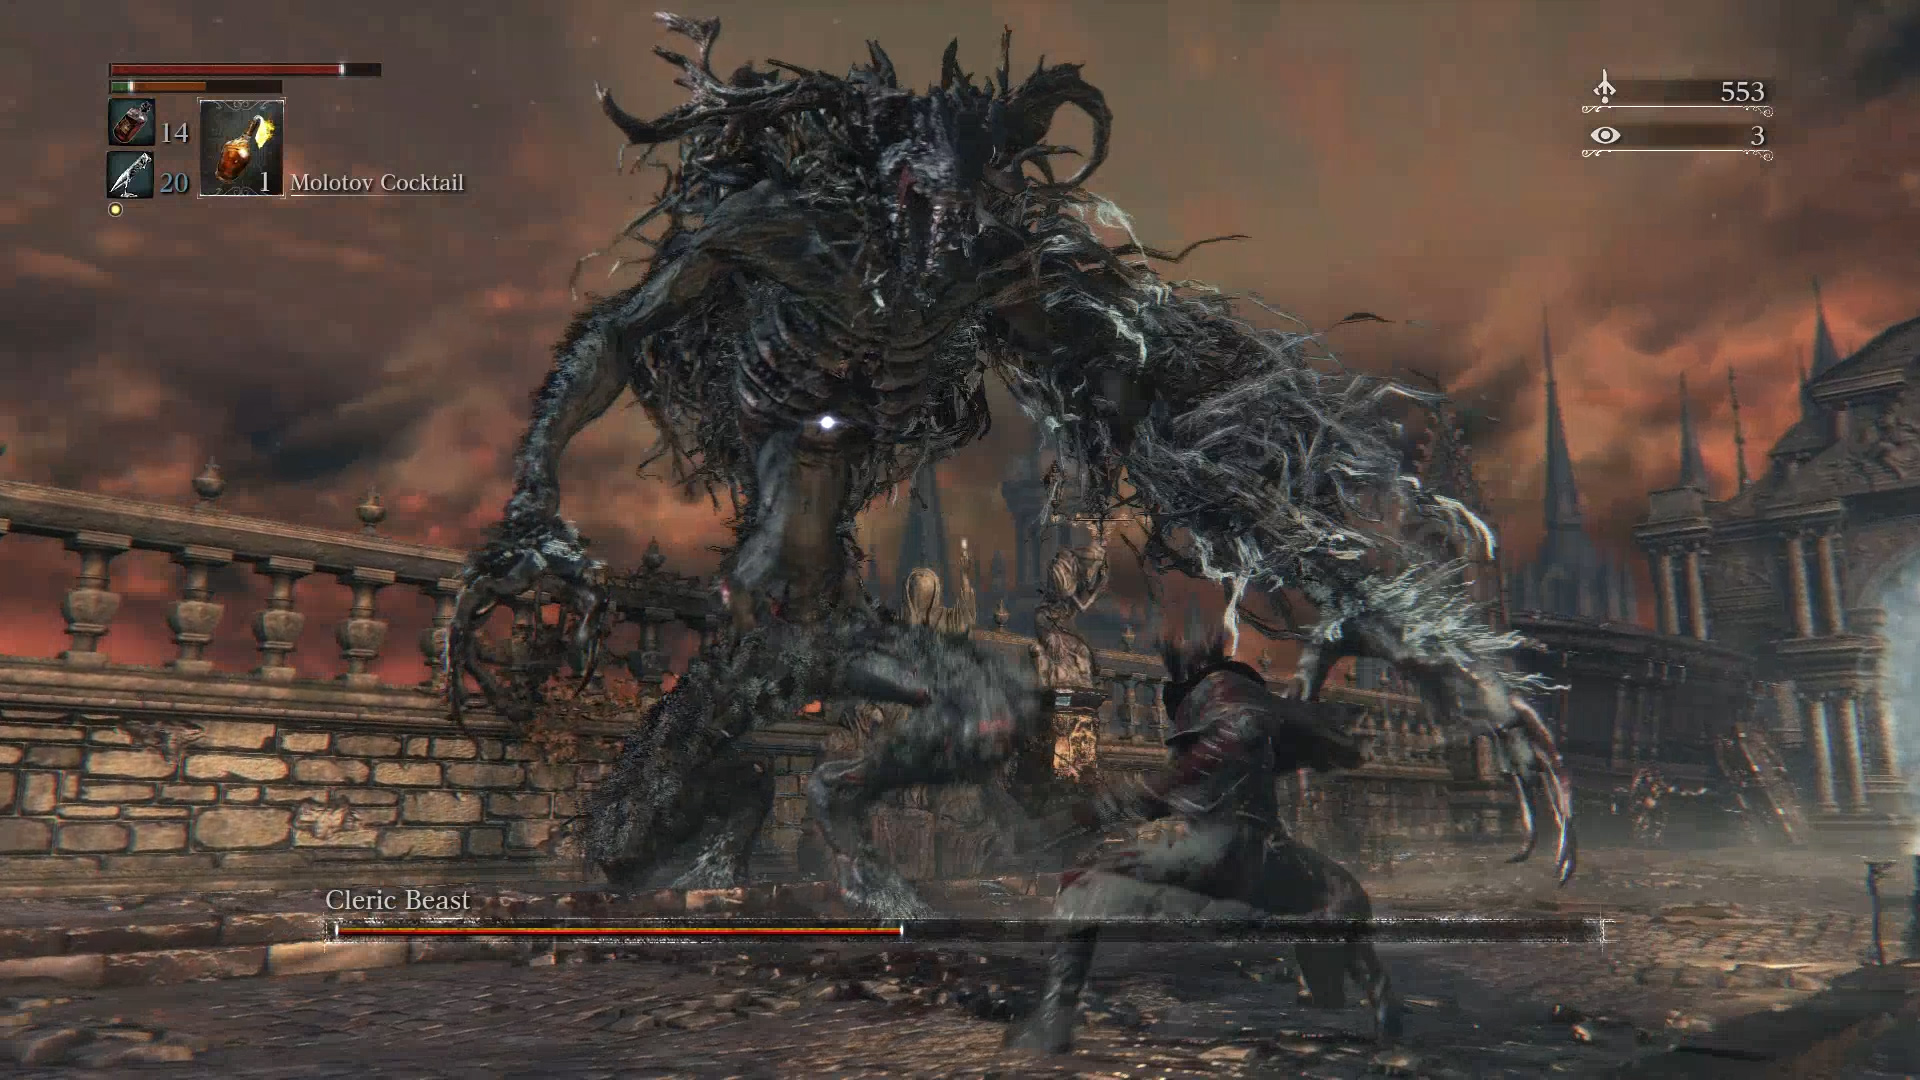 Bloodborne - Cleric Beast Boss Fight Walkthrough (Cleric Beast ...